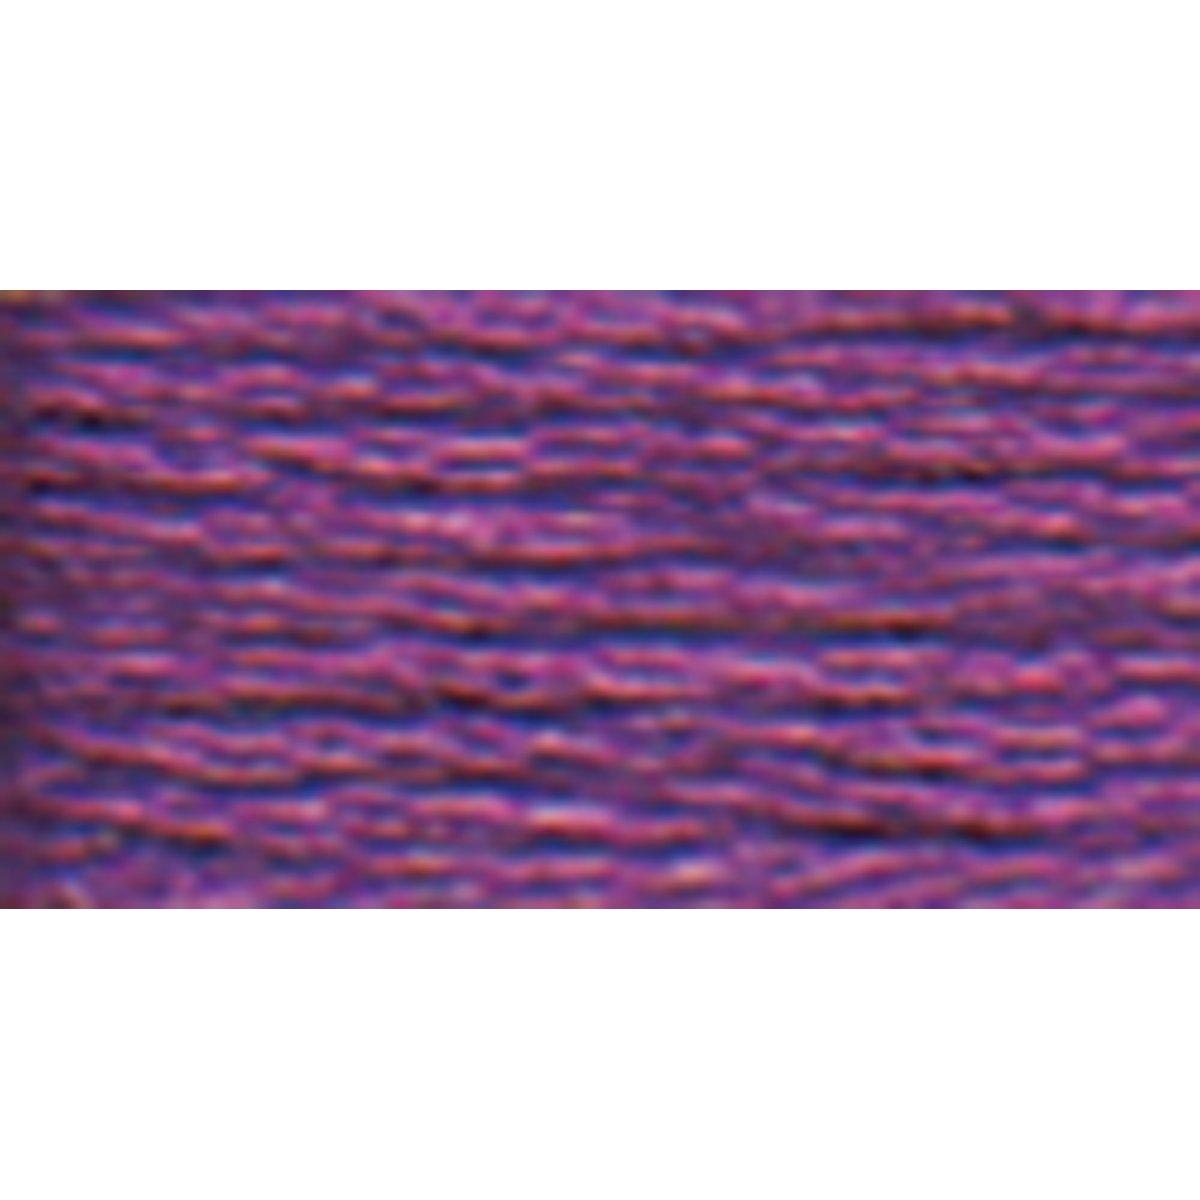 Size 8 Black DMC 116 8-310 Pearl Cotton Thread Balls